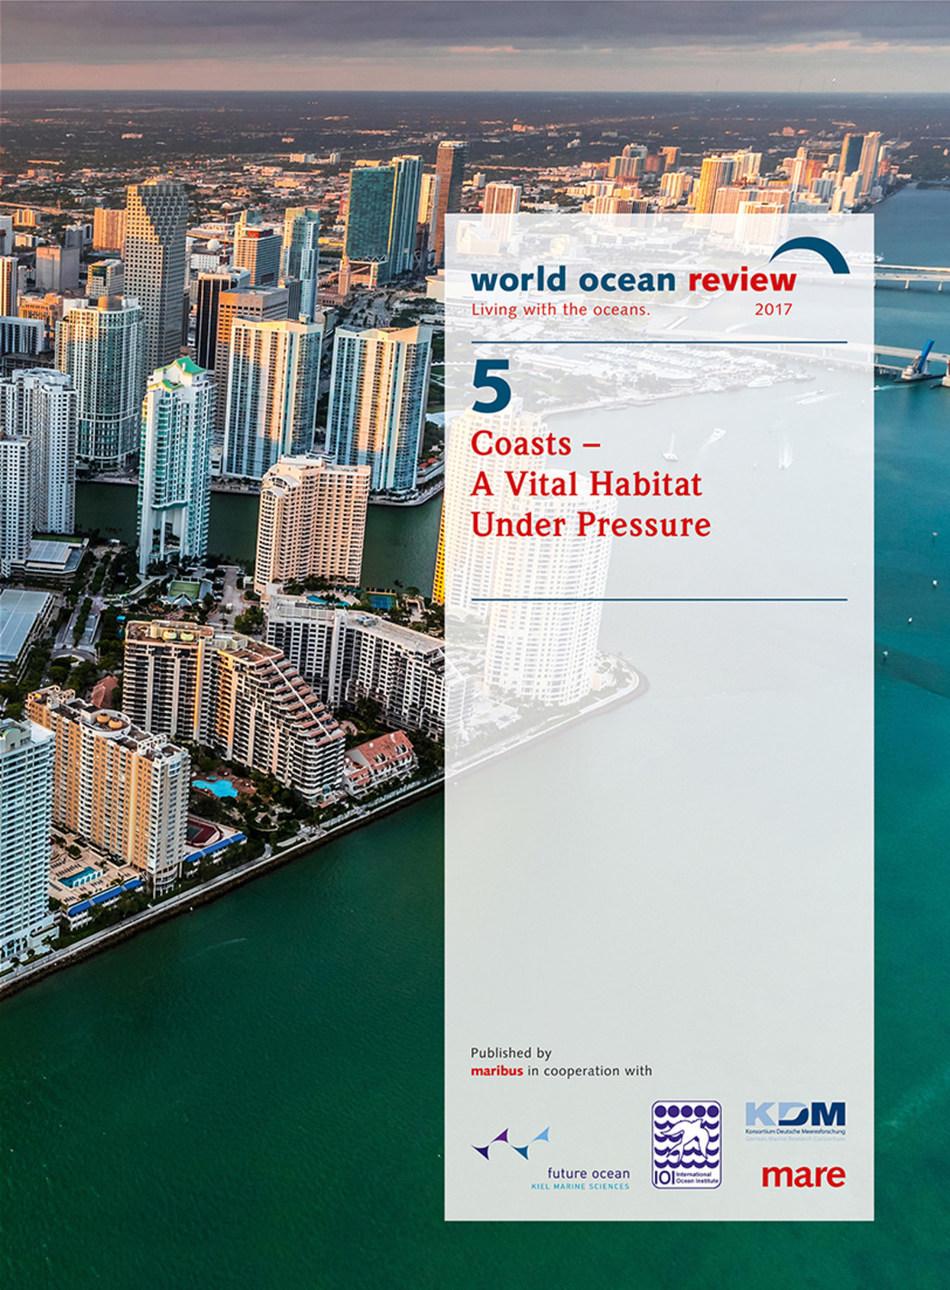 Coasts - A Vital Habitat Under Pressure (PRNewsfoto/maribus gGmbH)